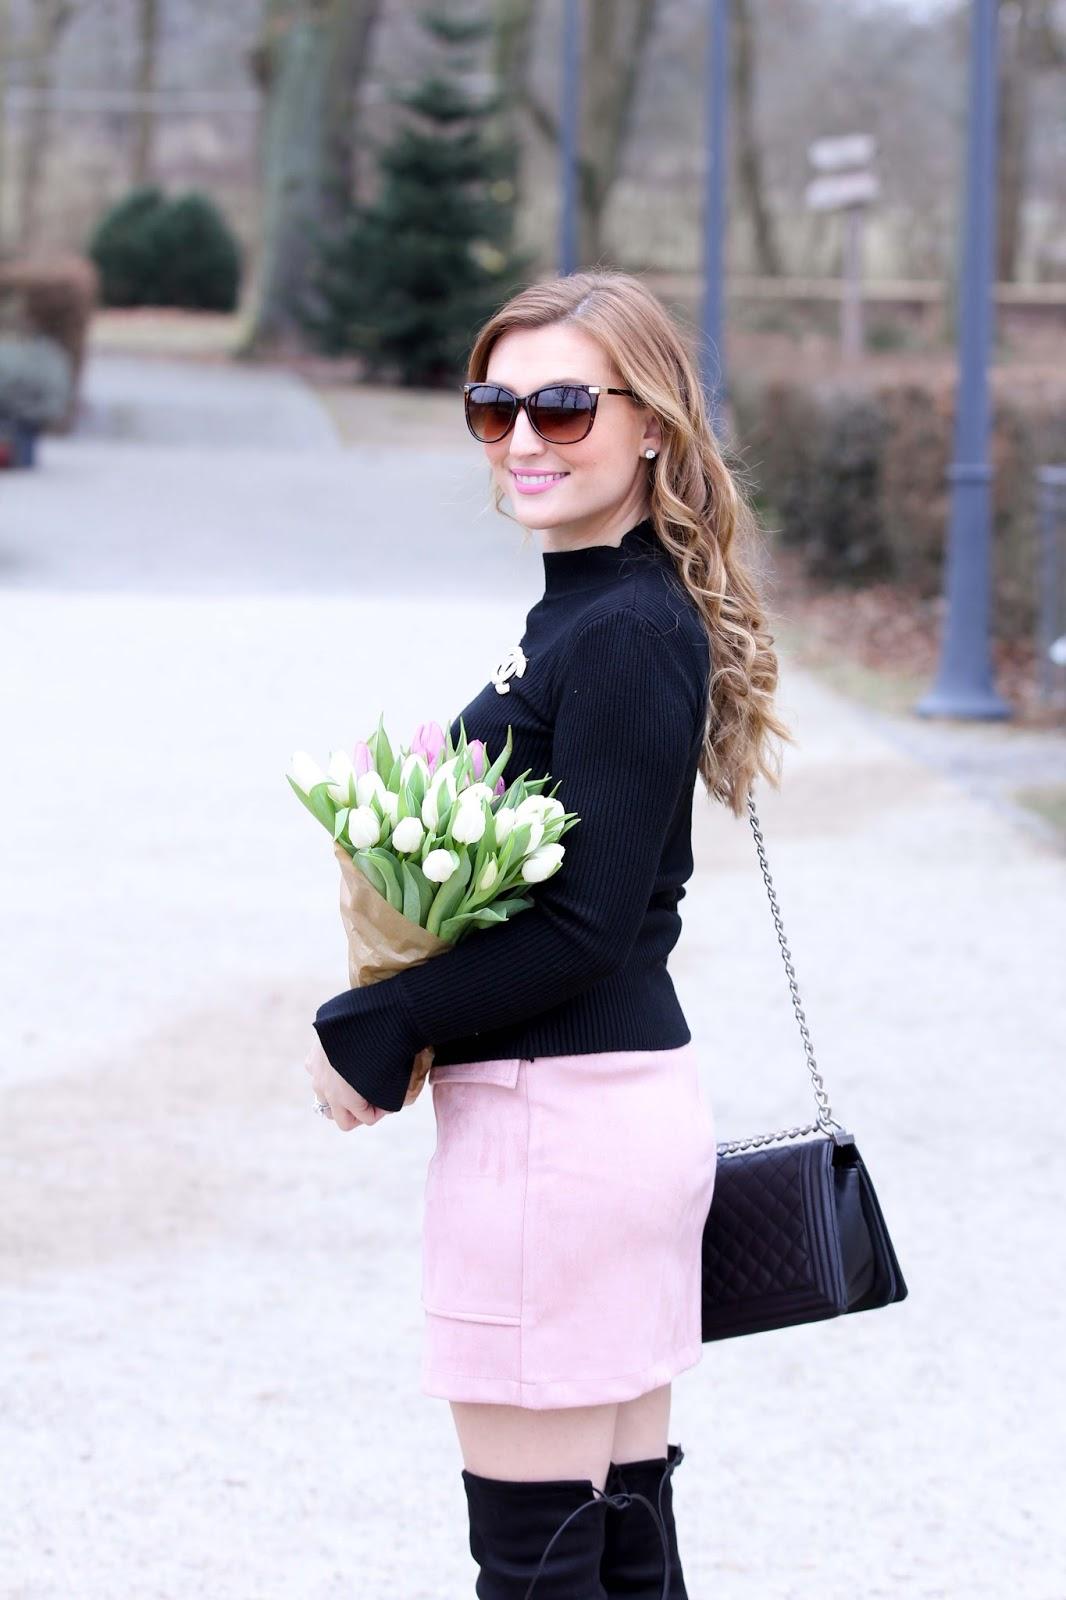 Rosa-rock-schwarzer-Pullover-Schwarze-Overknees-Rosa-Lippenstift-Deutsche-Fashionblogger